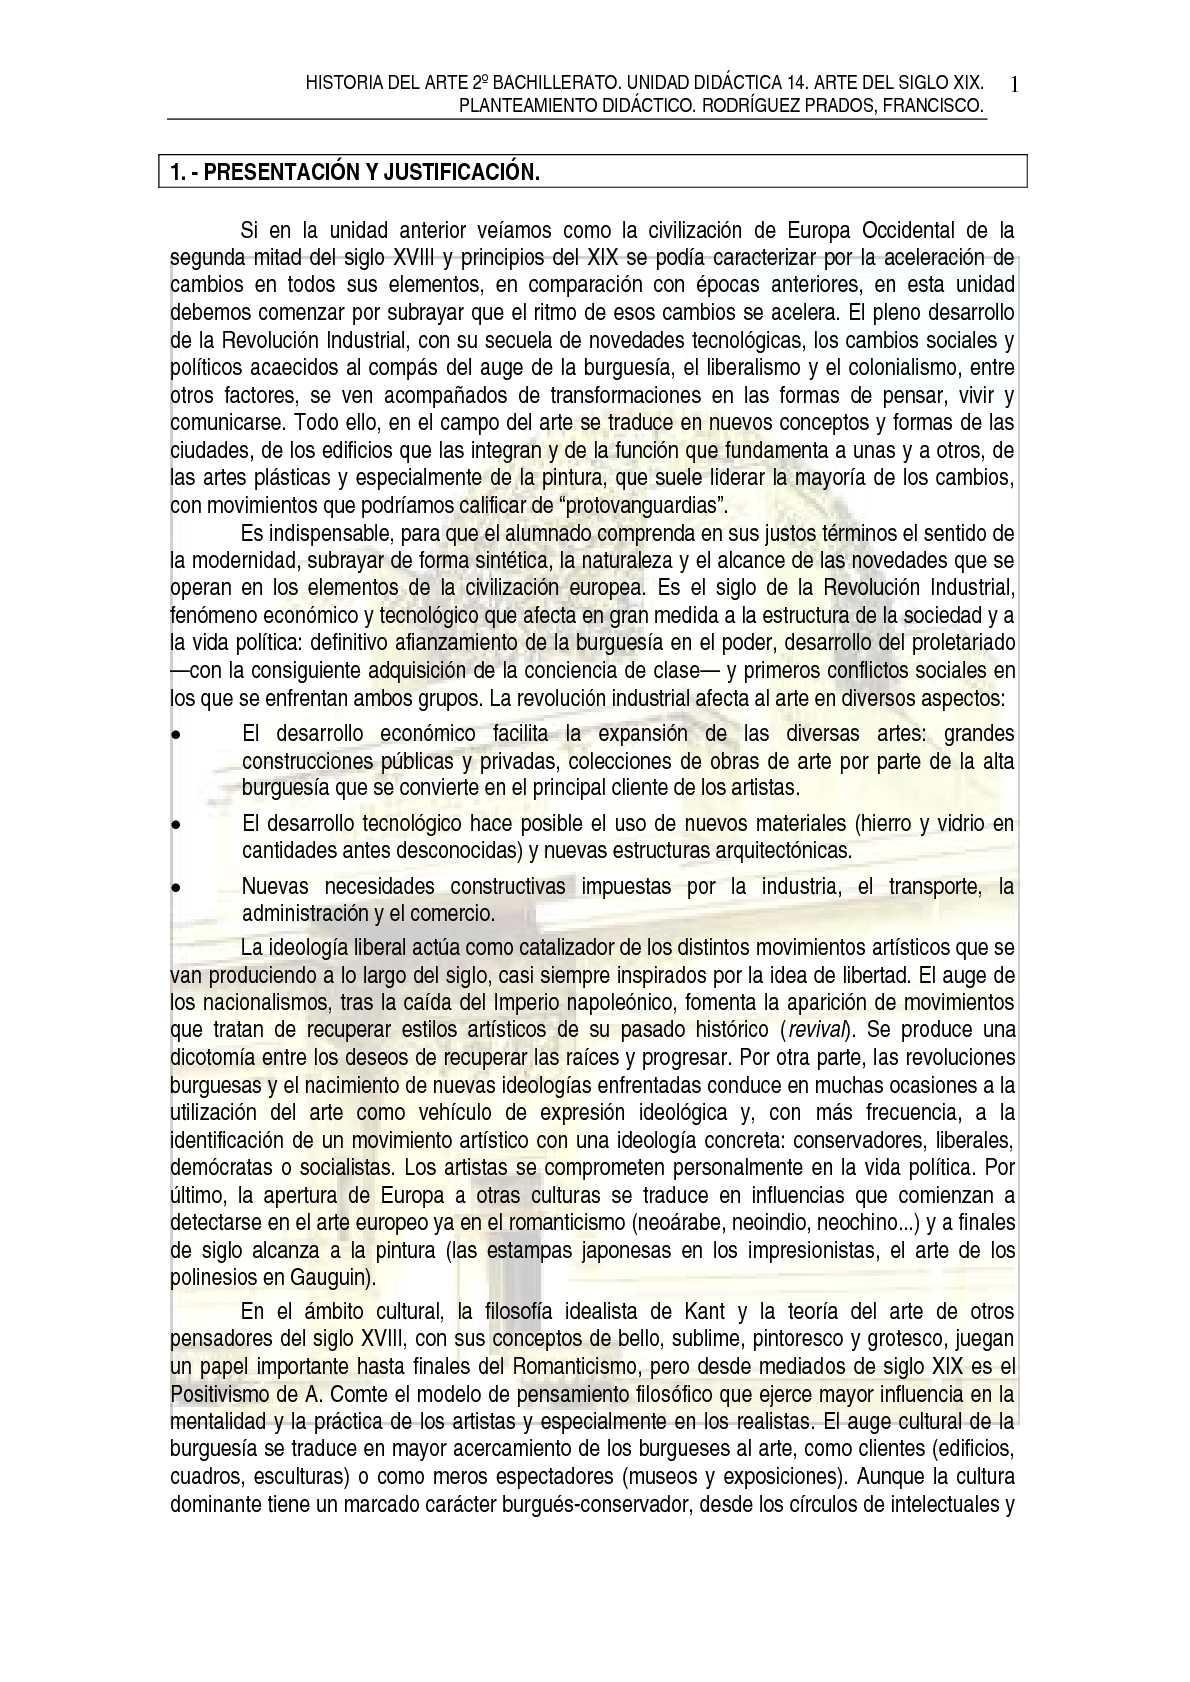 TEMA 14. ARTE SIGLO XIX